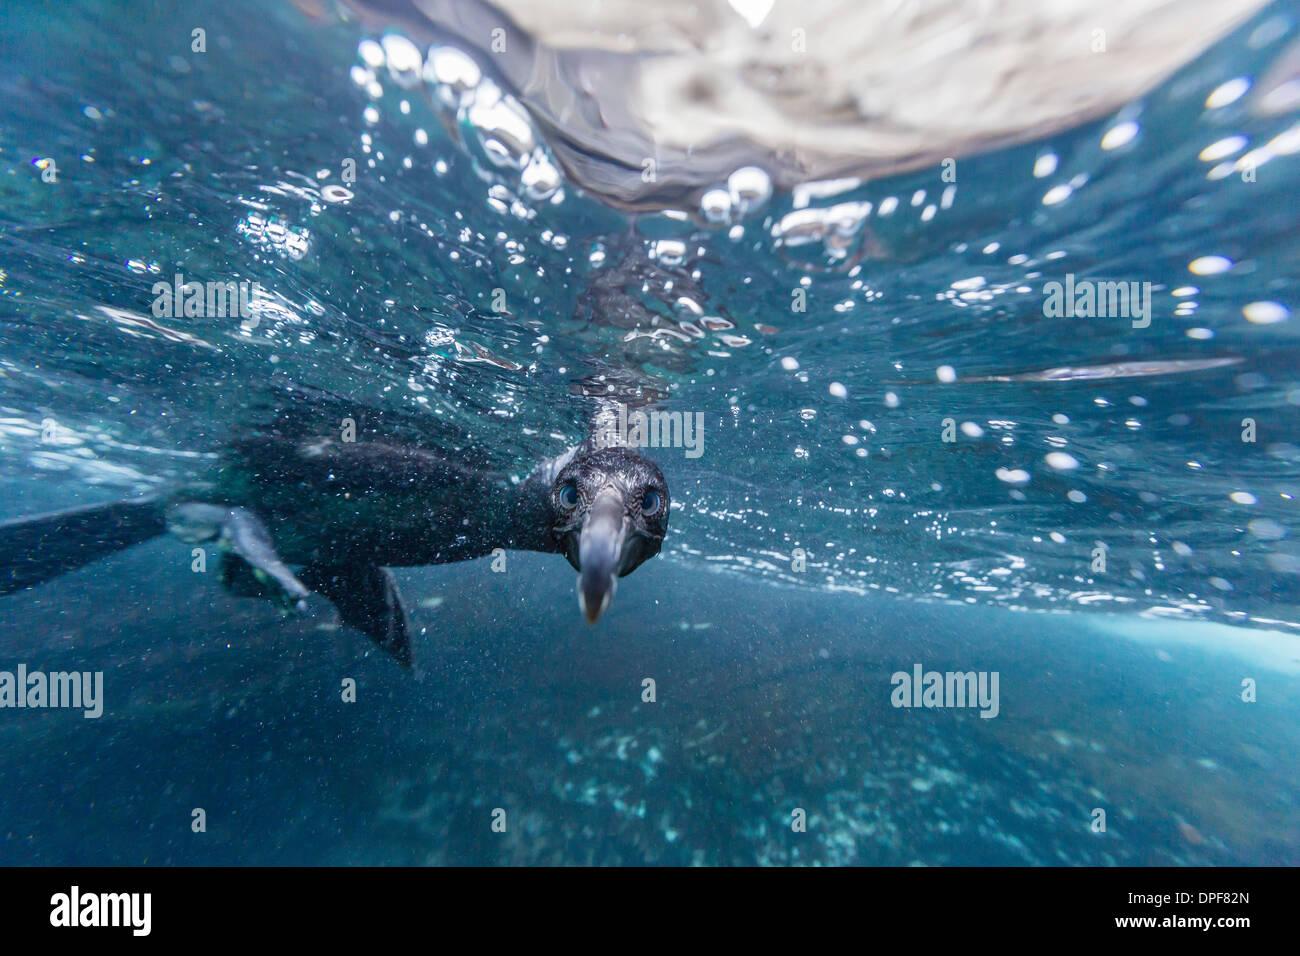 Curious flightless cormorant (Phalacrocorax harrisi) underwater at Tagus Cove, Isabela Island, Galapagos Islands, Ecuador - Stock Image